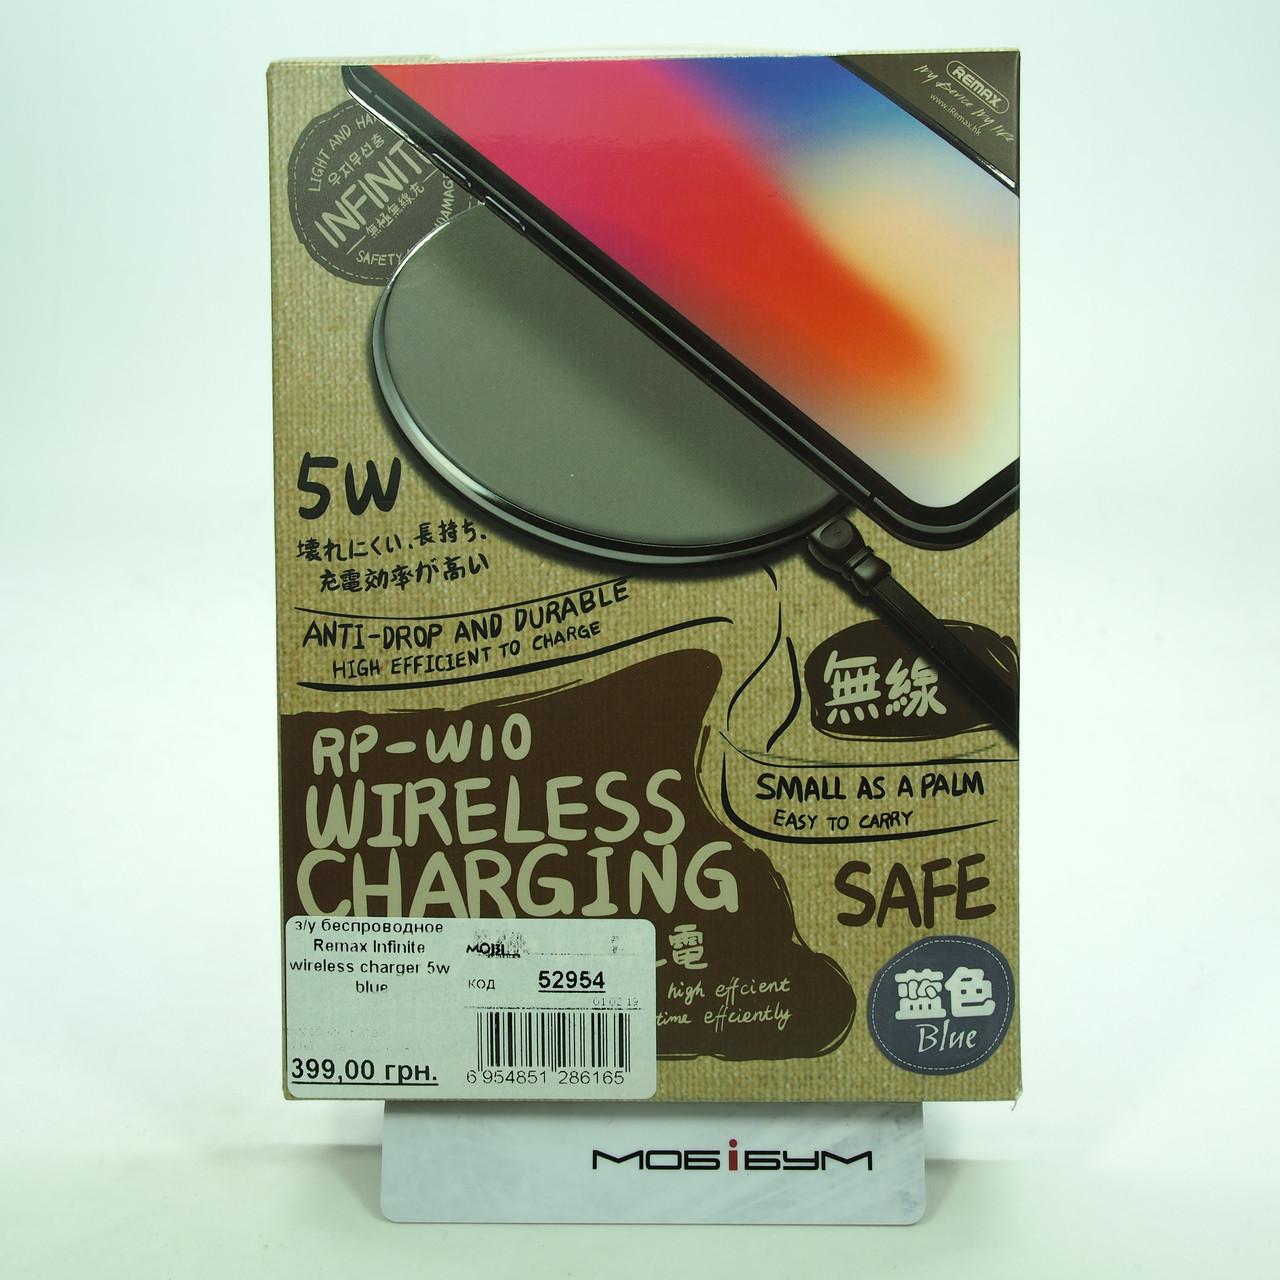 З/П бездротове Remax Infinite wireless charger 5w blue (RP-W10-BLUE)